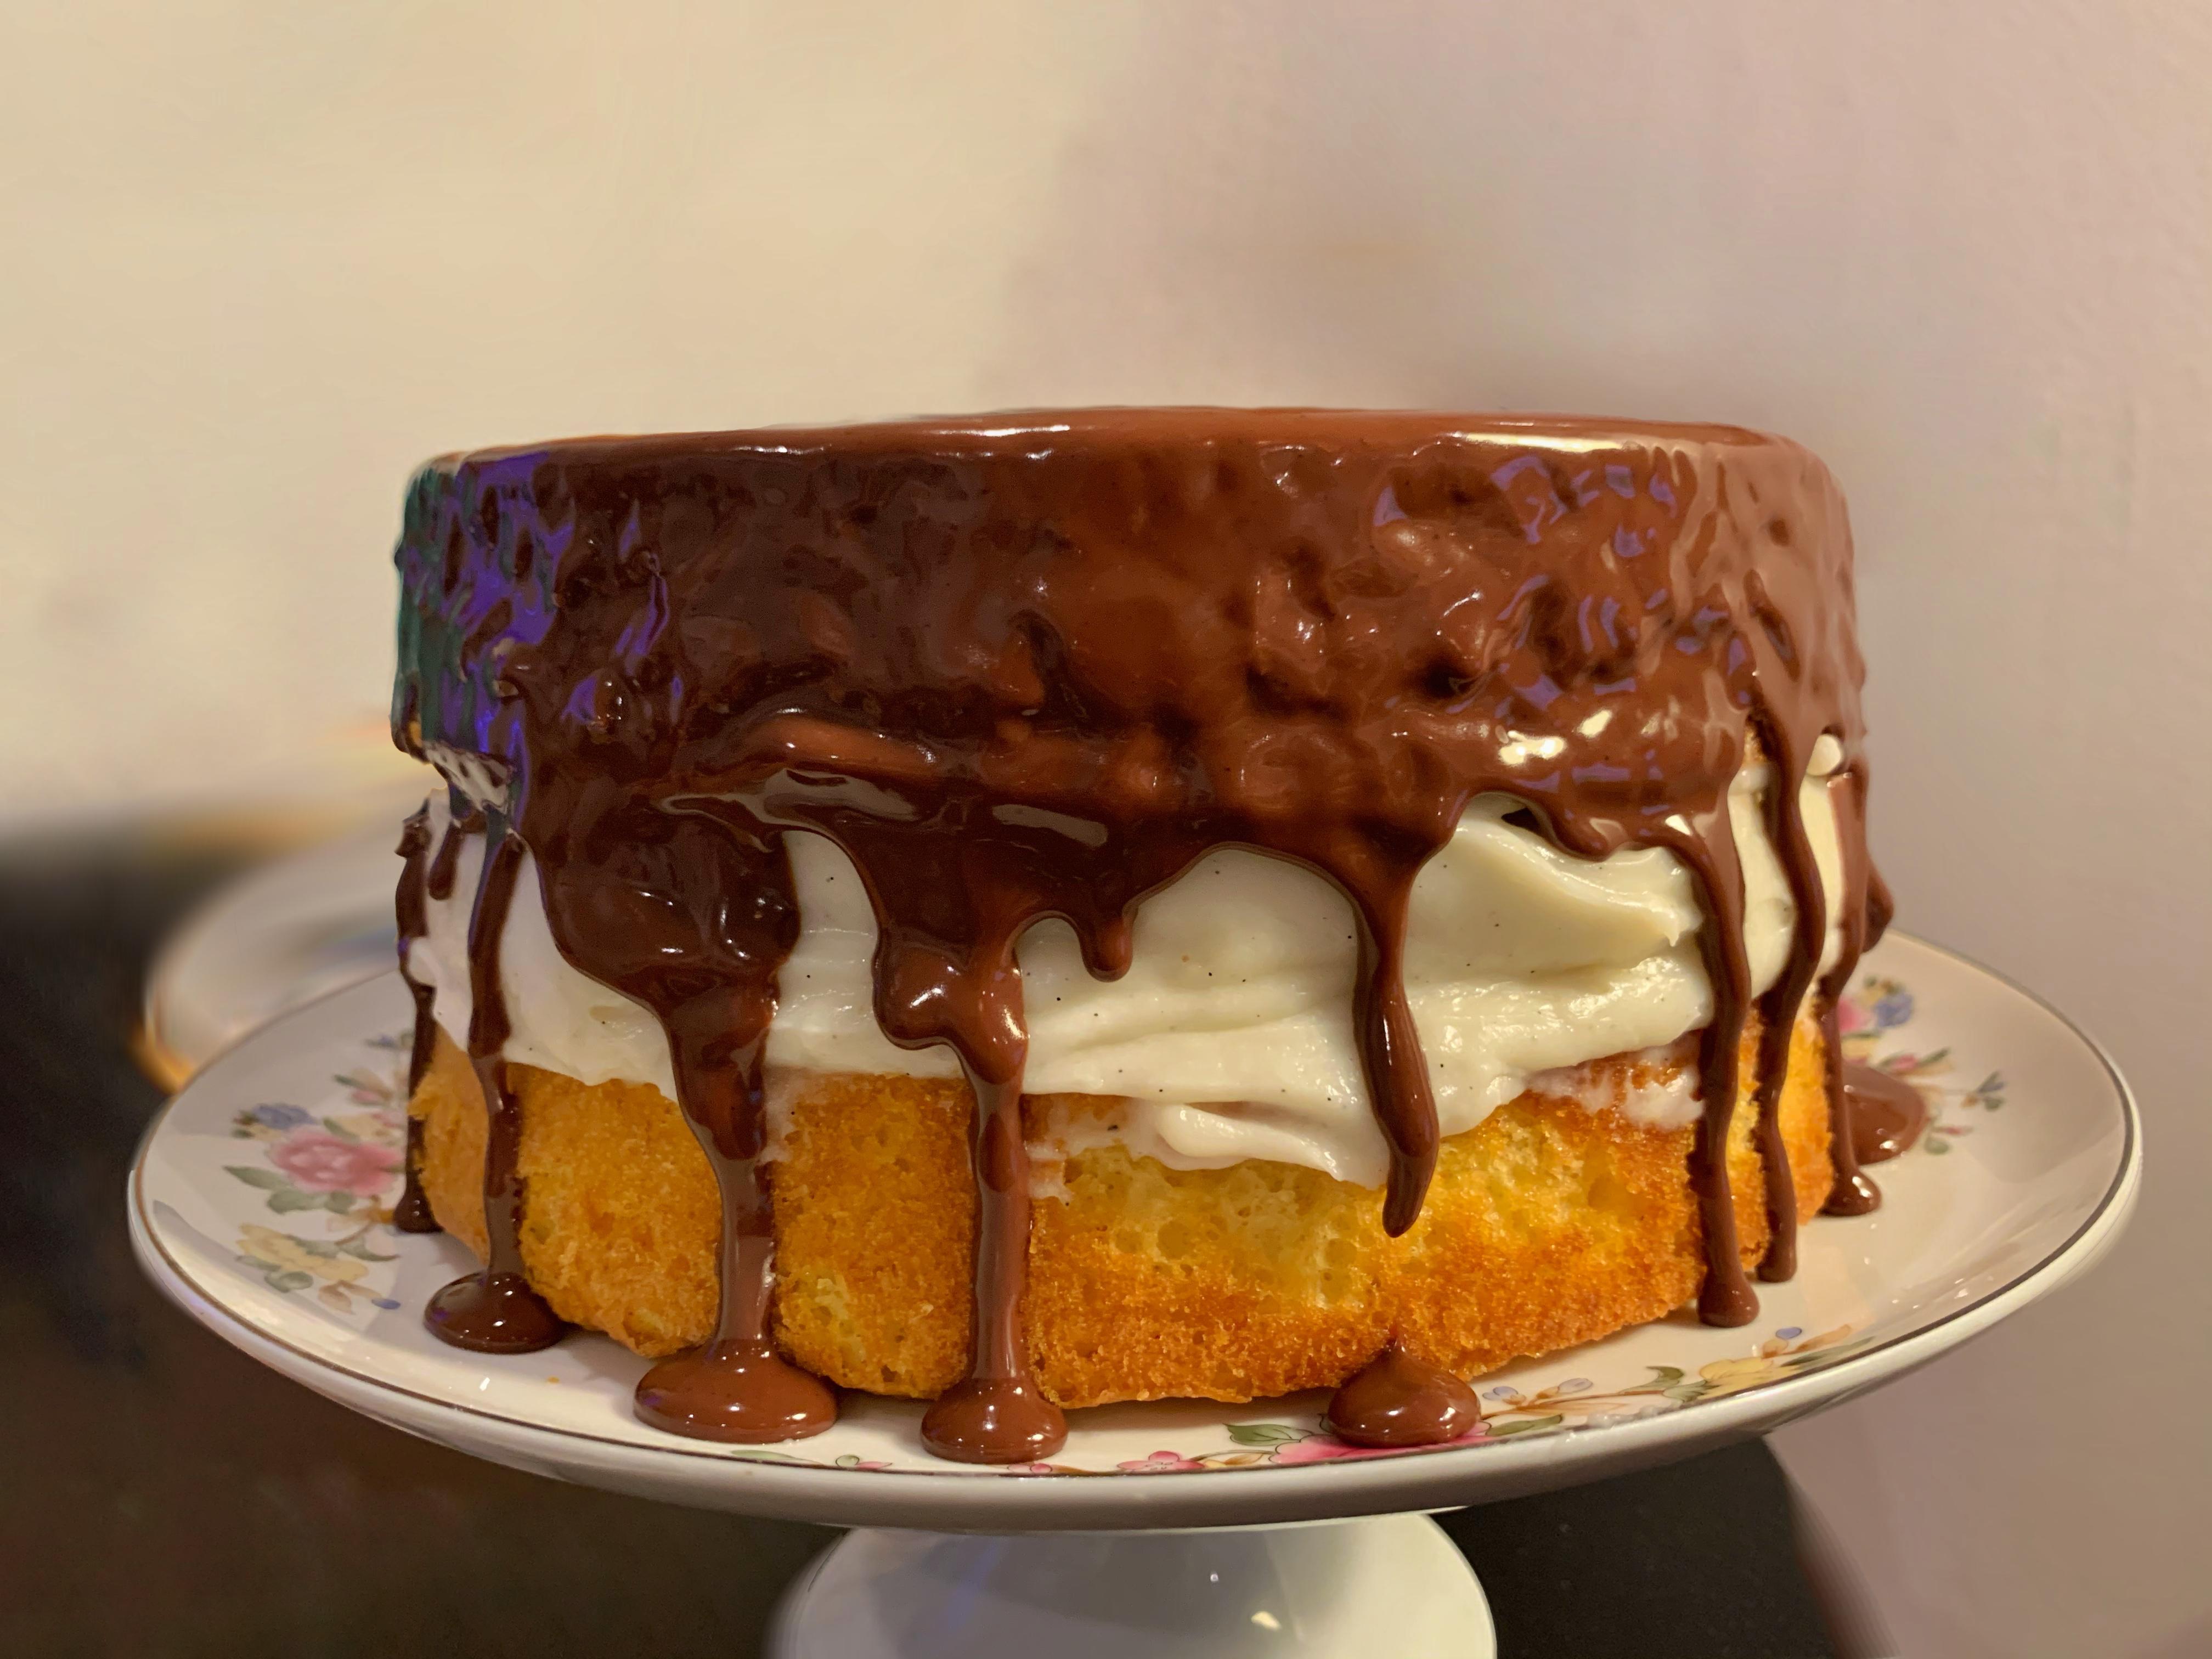 A Boston cream pie on a cake plate